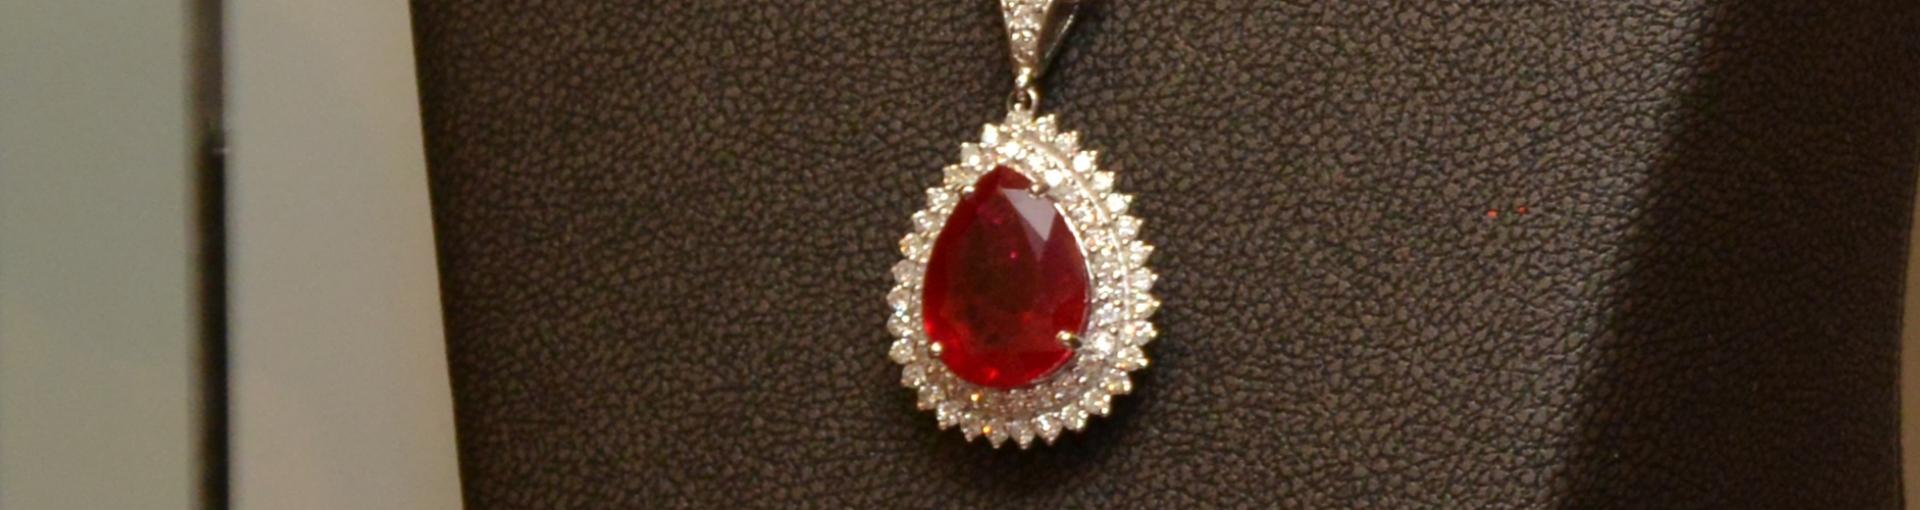 diana bijoux